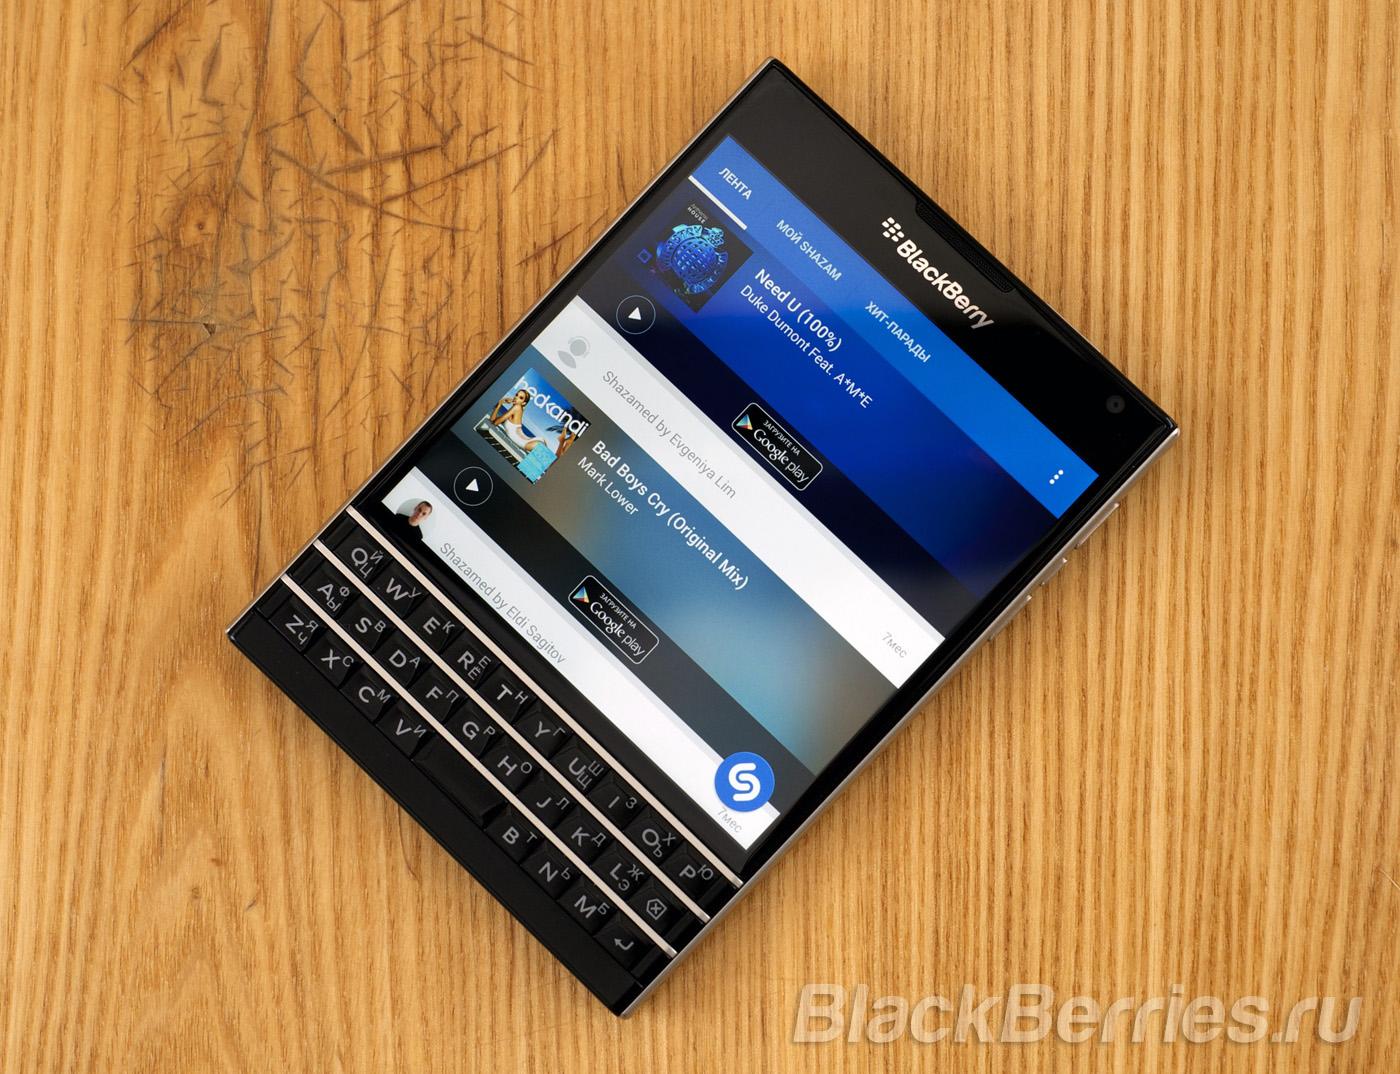 BlackBerry-Passport-Shazam-2